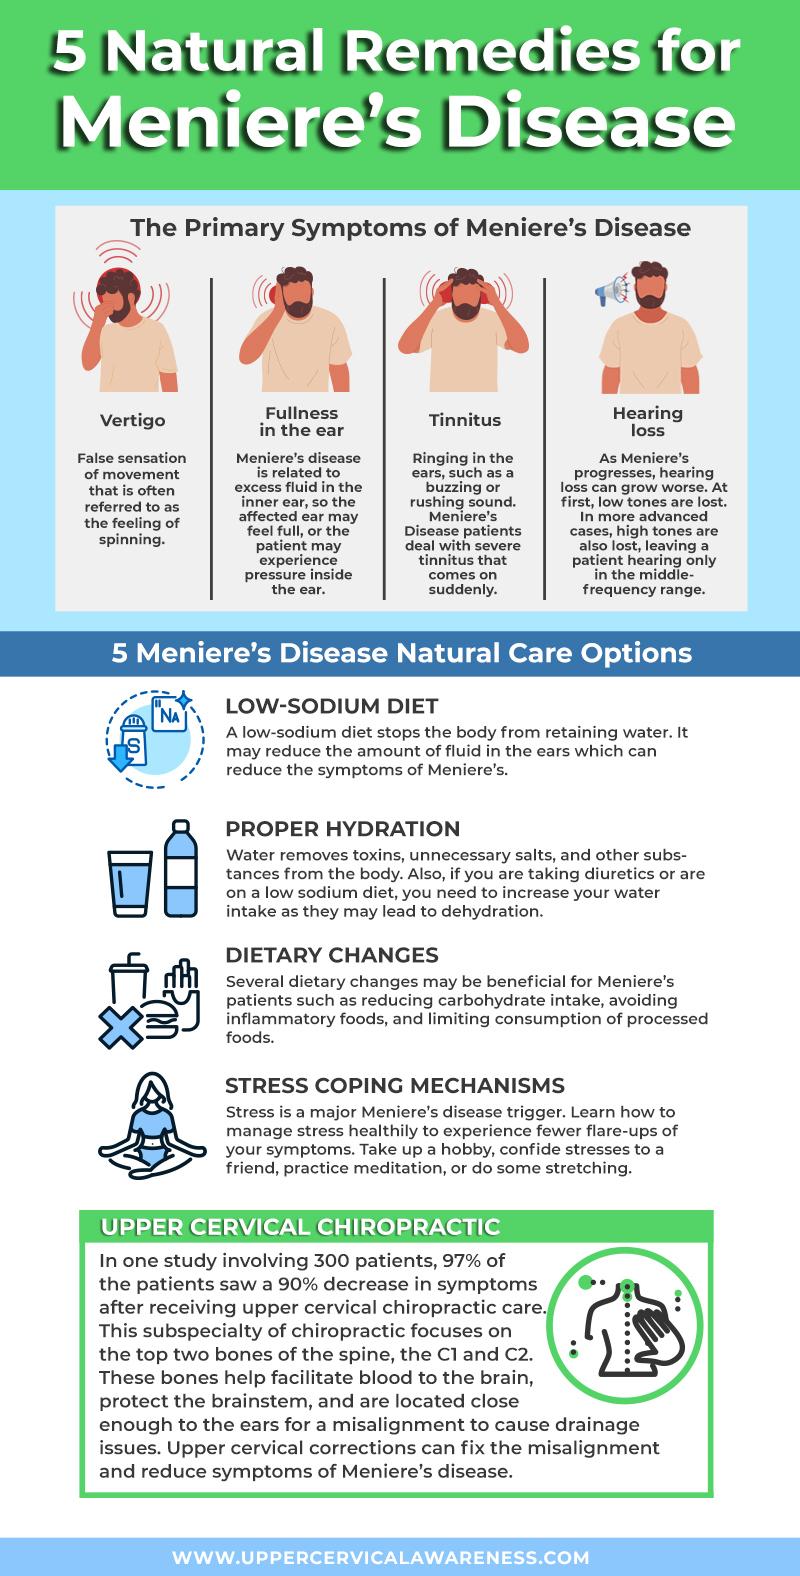 5 Natural Remedies for Meniere's Disease